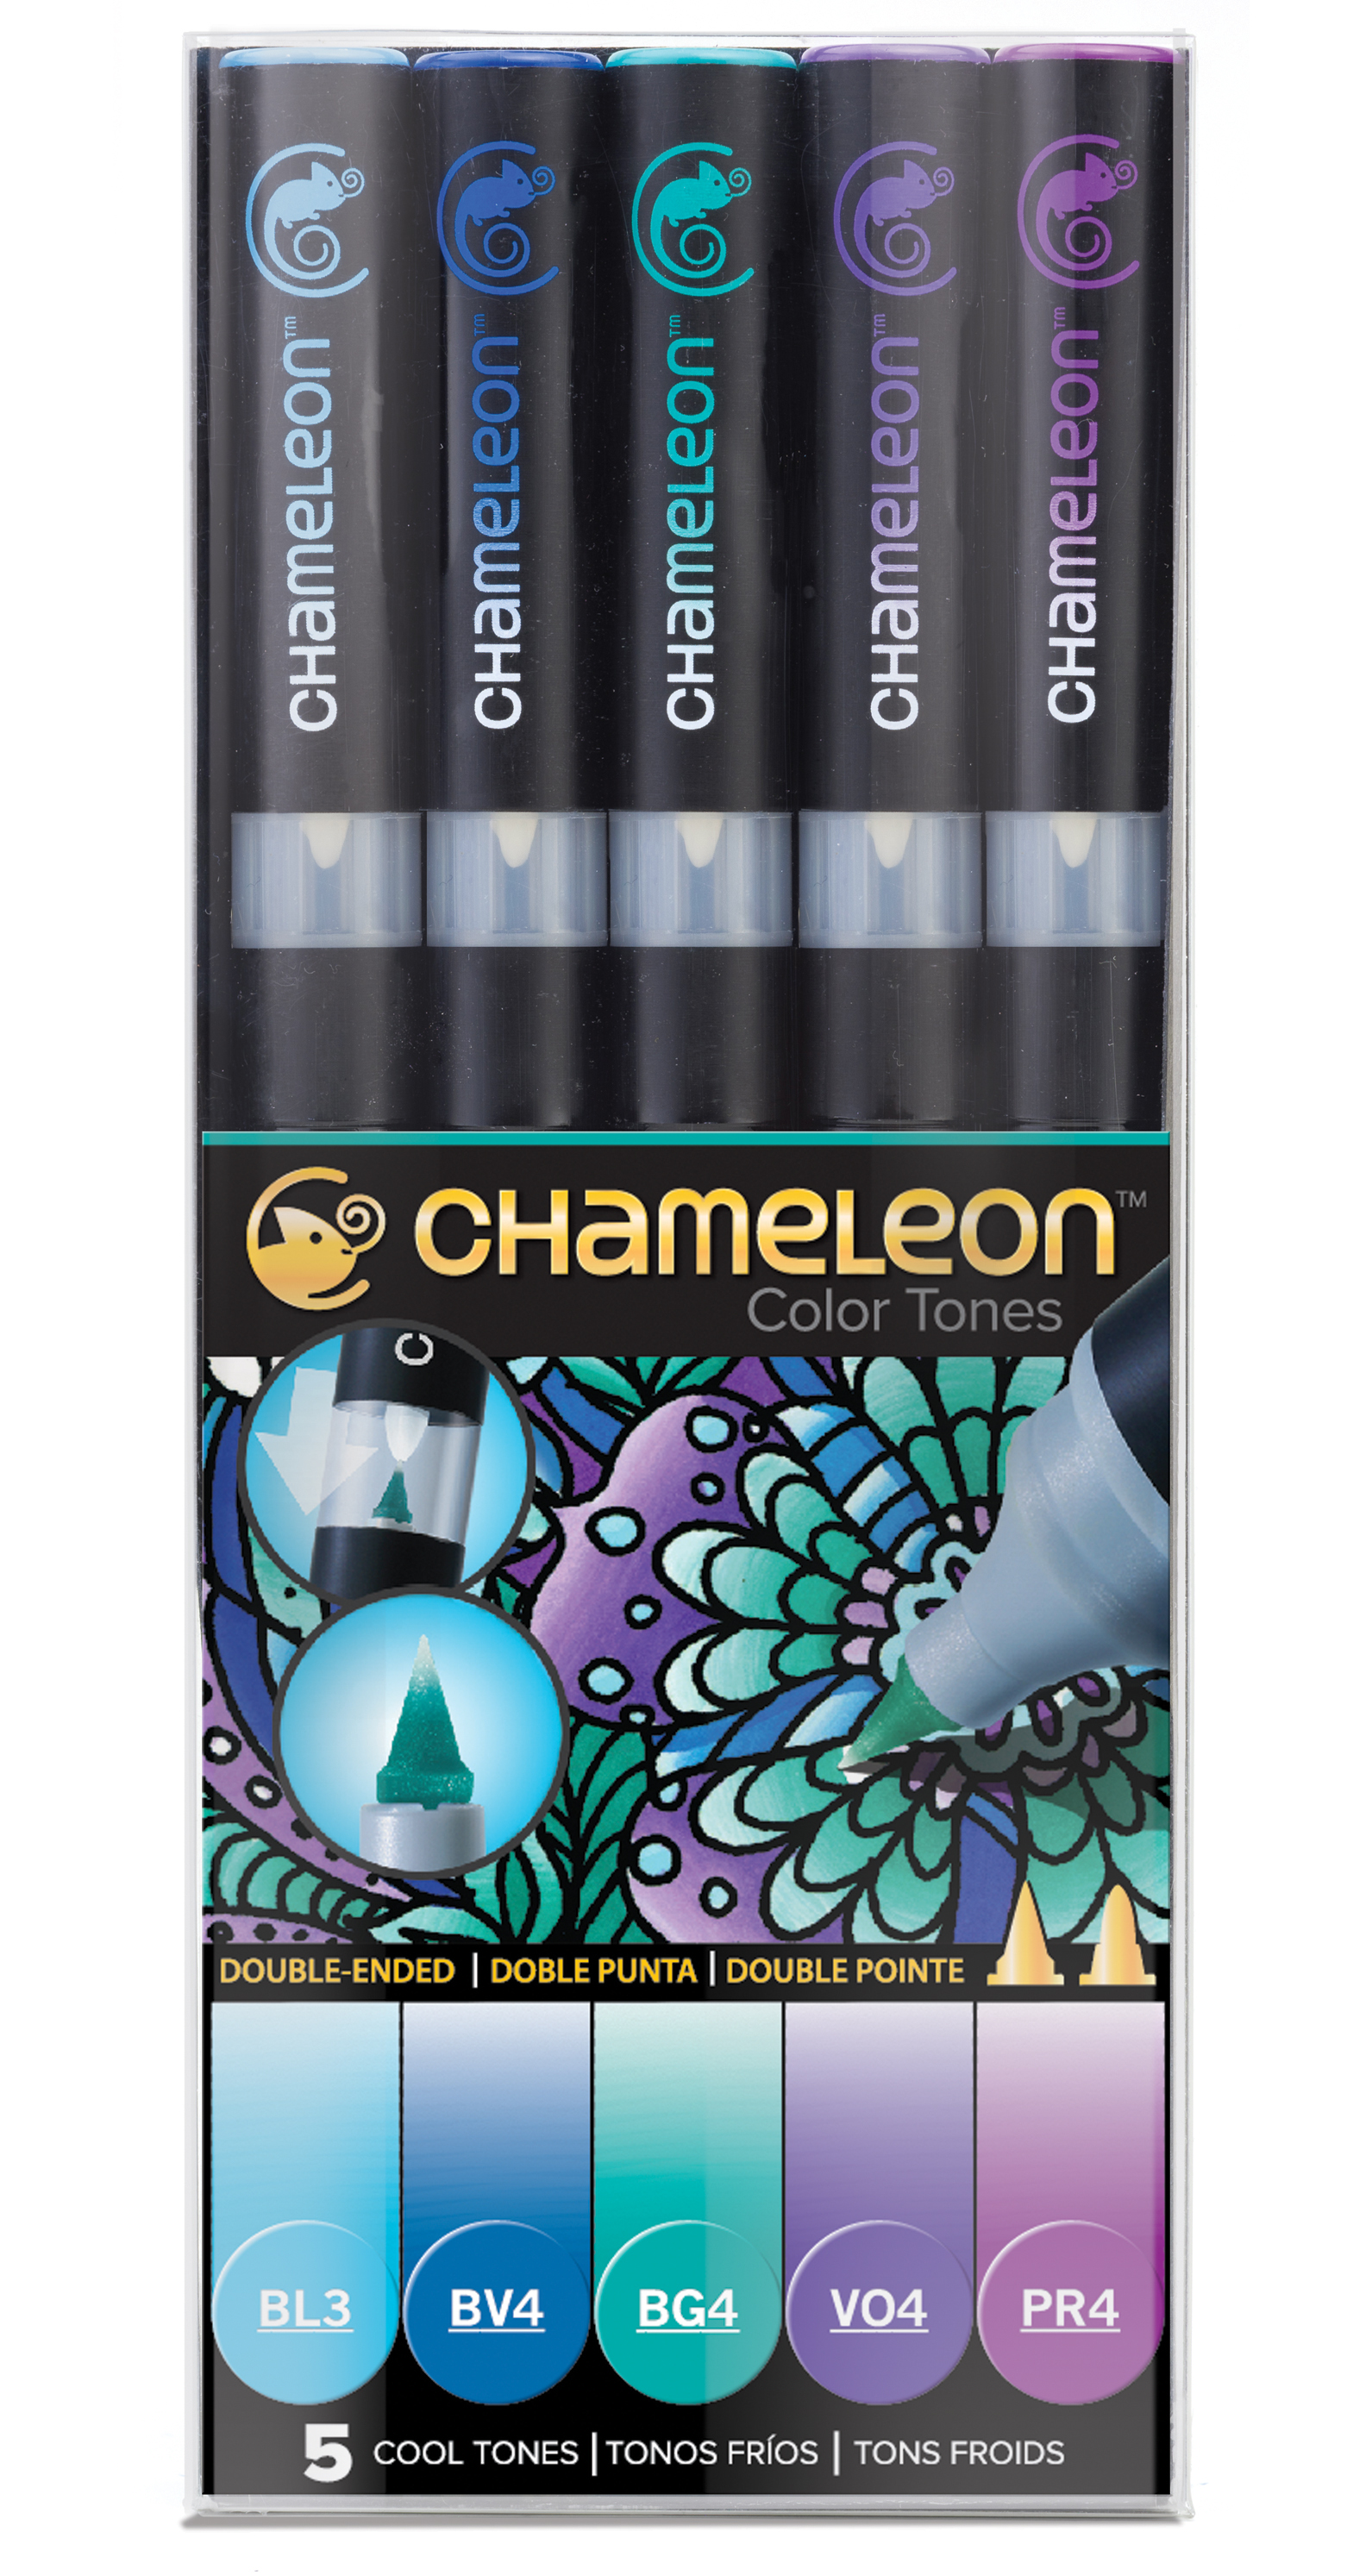 Chameleon Pen 5 Pen Cool Set (カメレオンペン 5本入りクールセット)